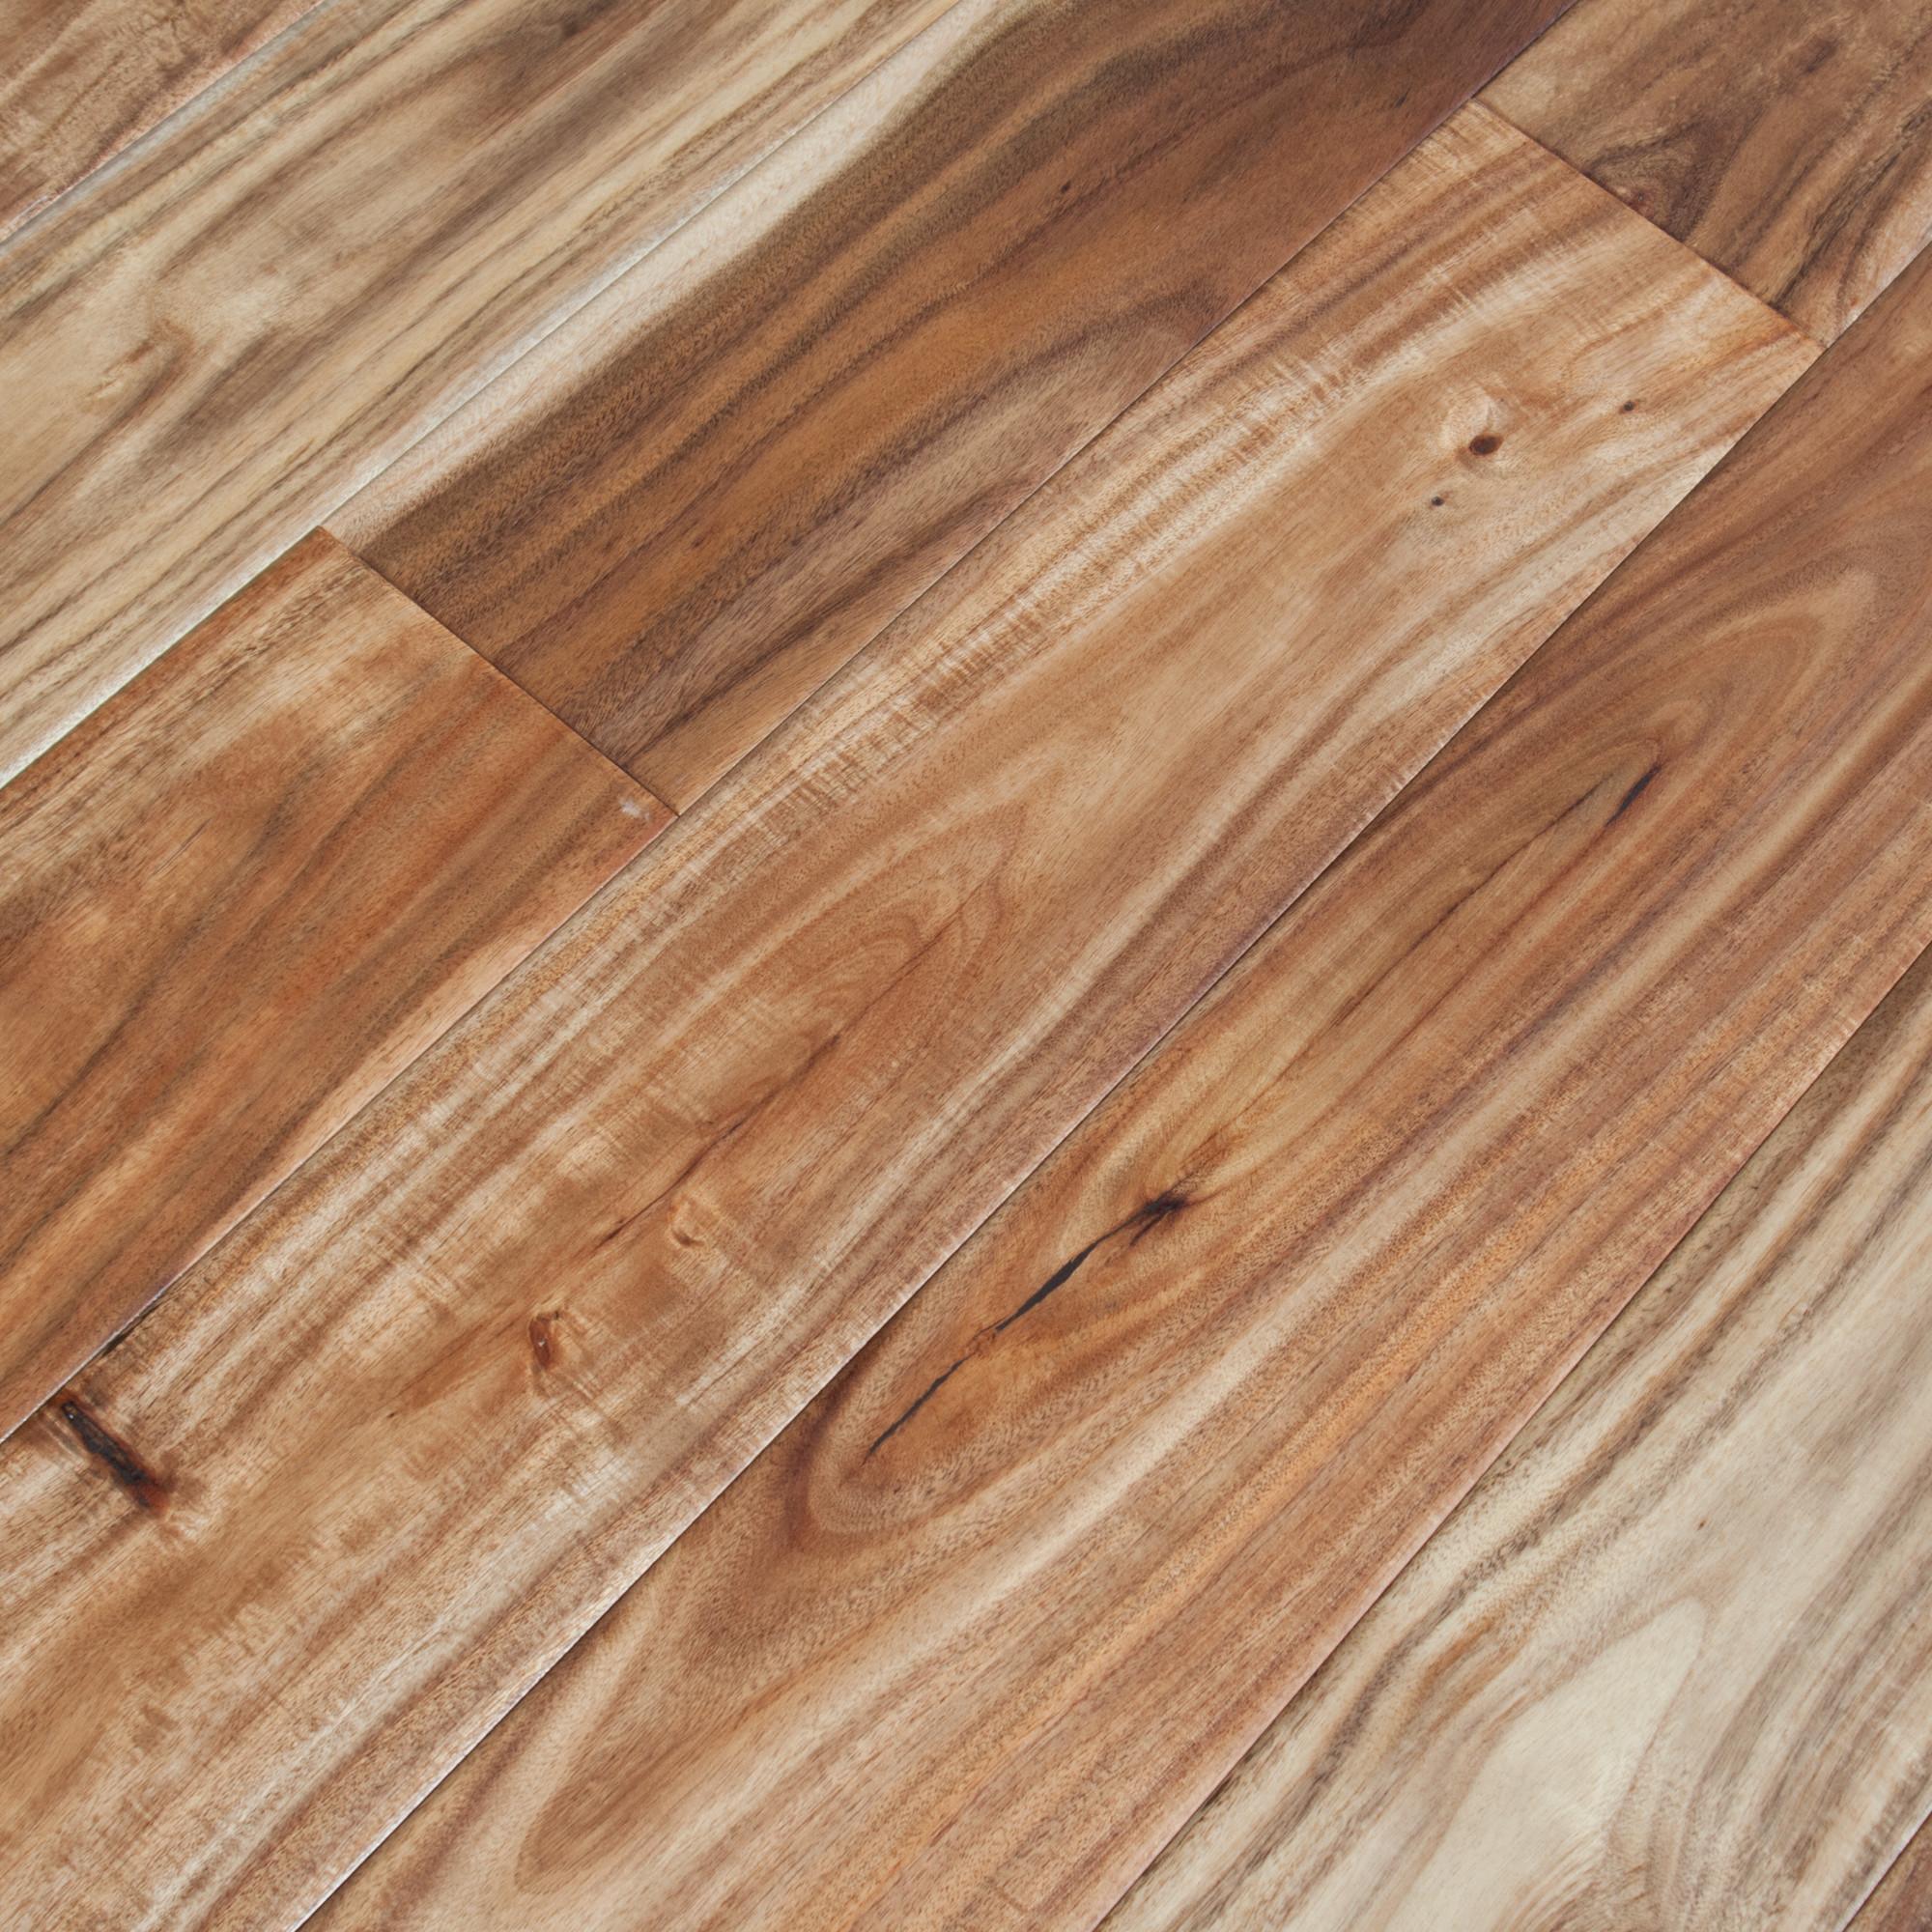 17 Fabulous Carbonized Bamboo Hardwood Flooring 2021 free download carbonized bamboo hardwood flooring of hand scraped hardwood flooring non slip hardwood floor intended for acacia handscraped natural hardwood flooring